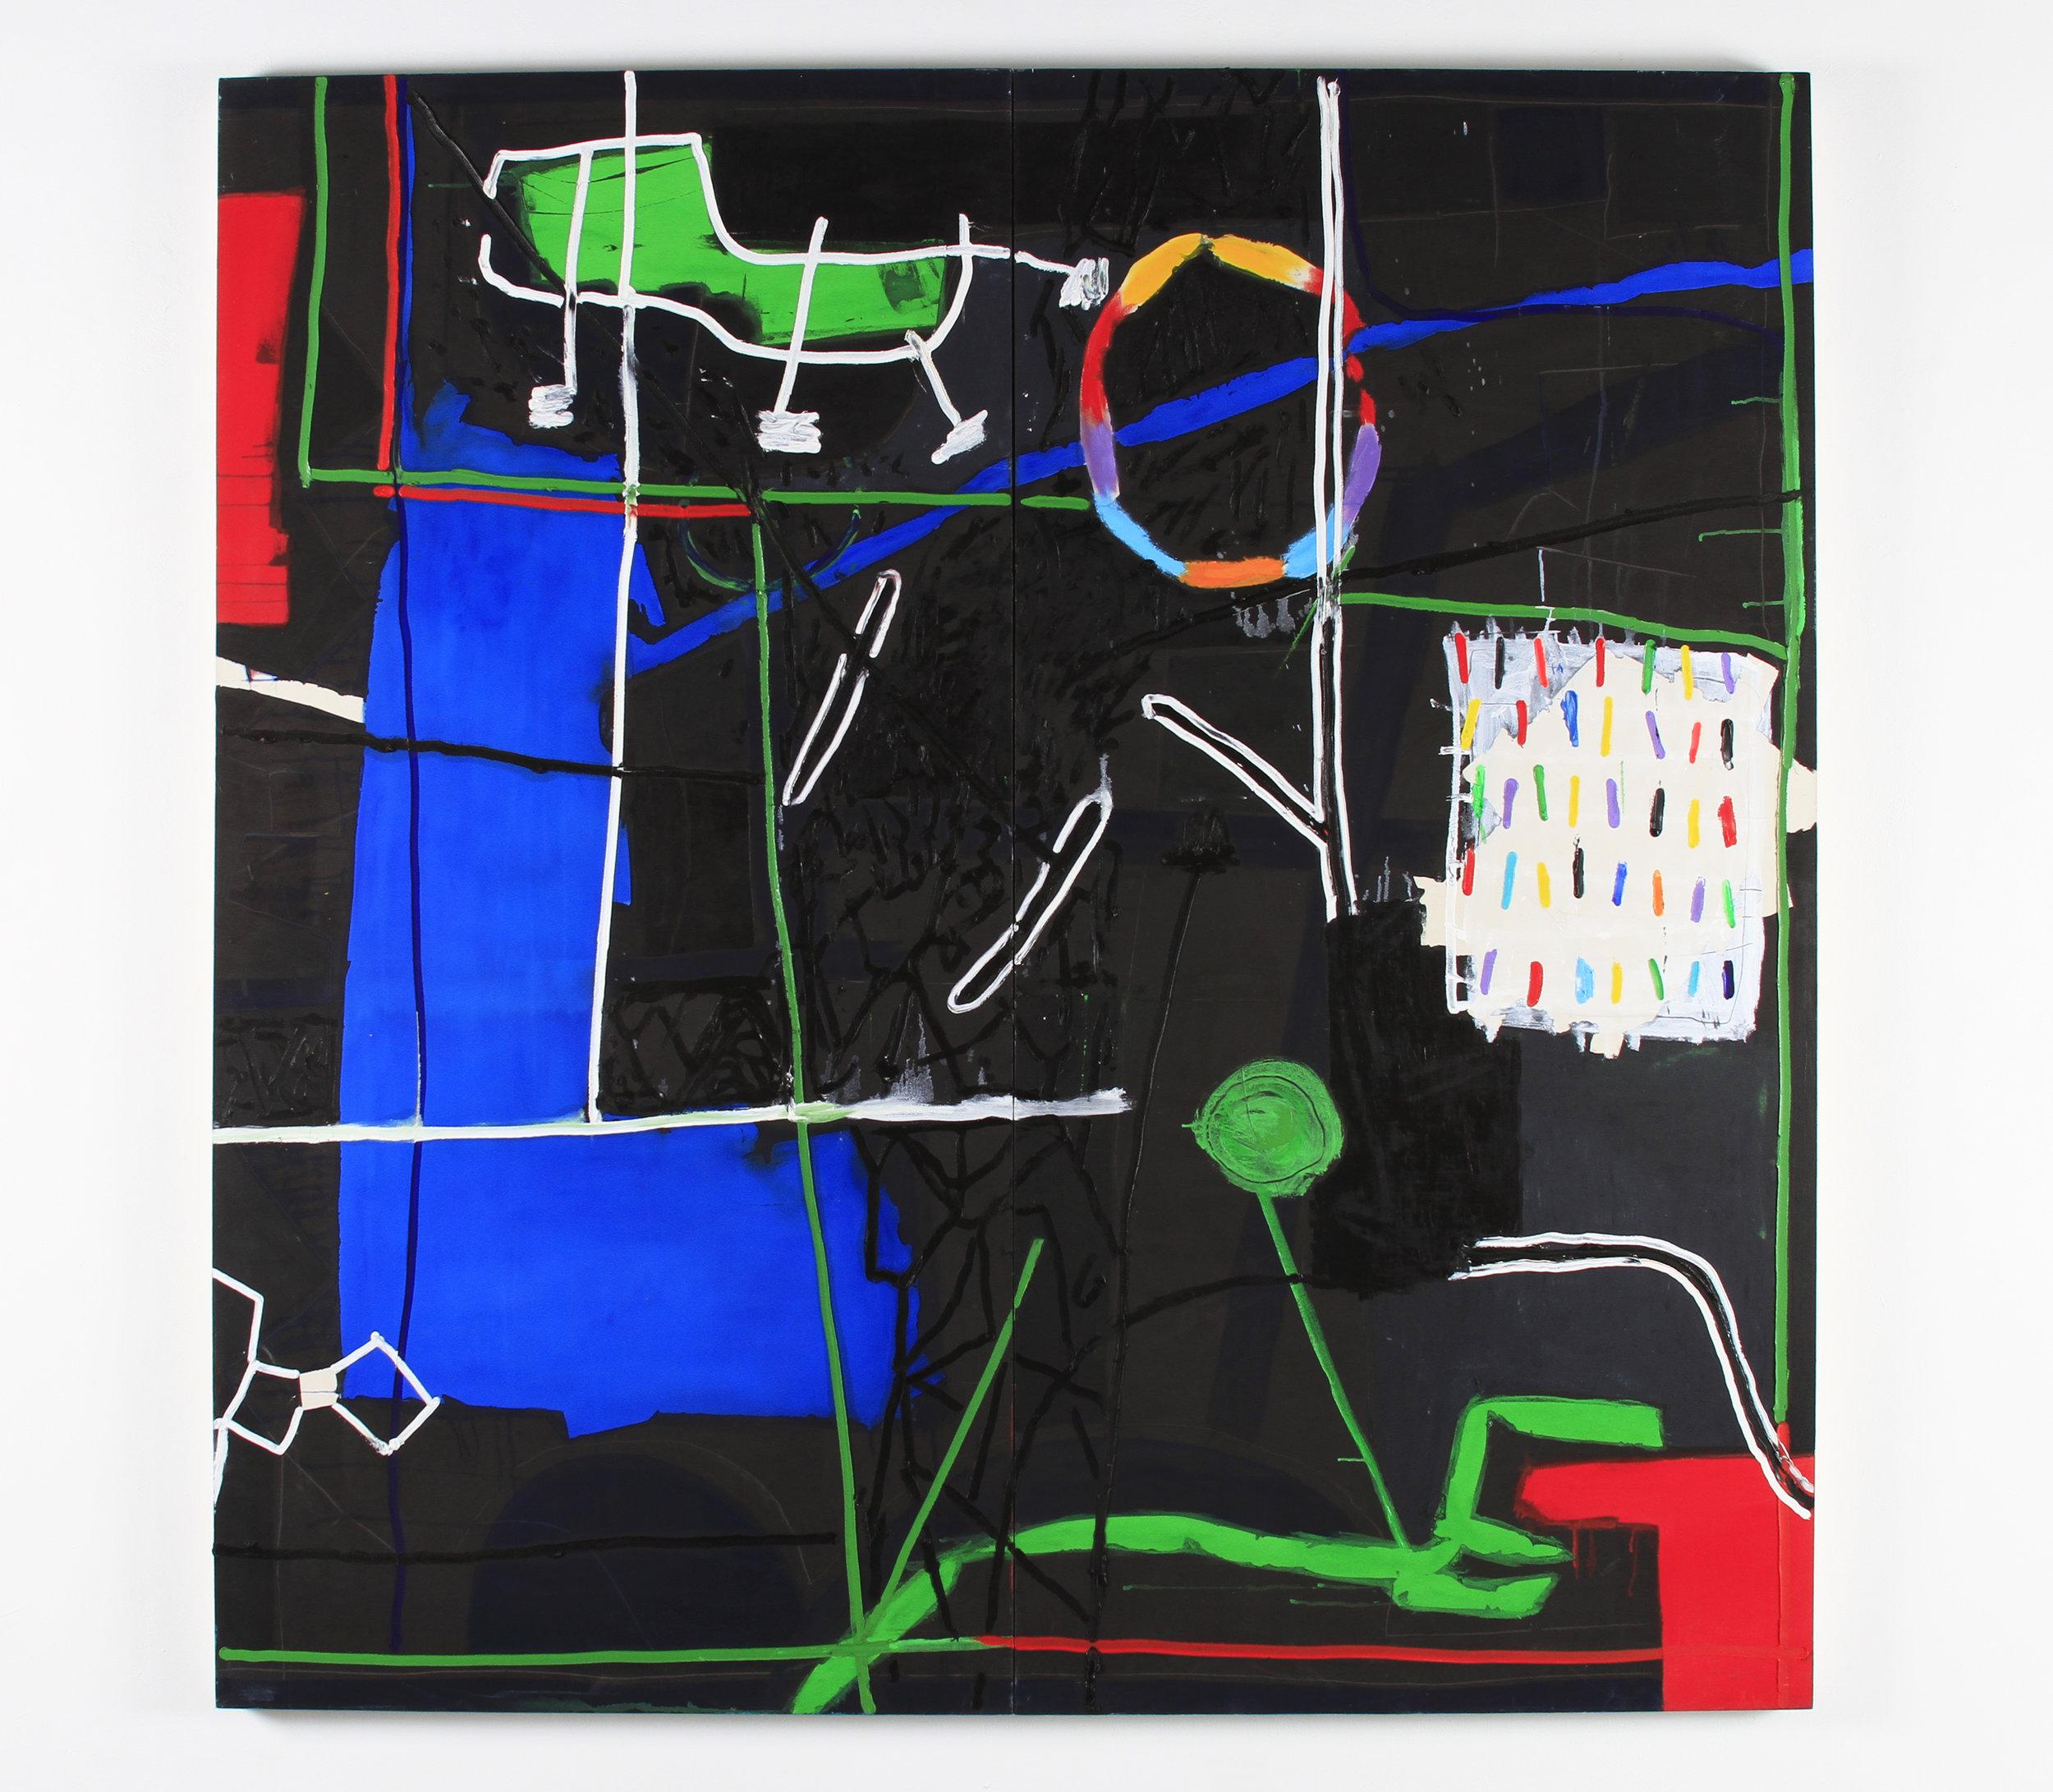 Gustavo Ramos Rivera, Divertimento, 2009, oil on canvas, 84 x 84 inches